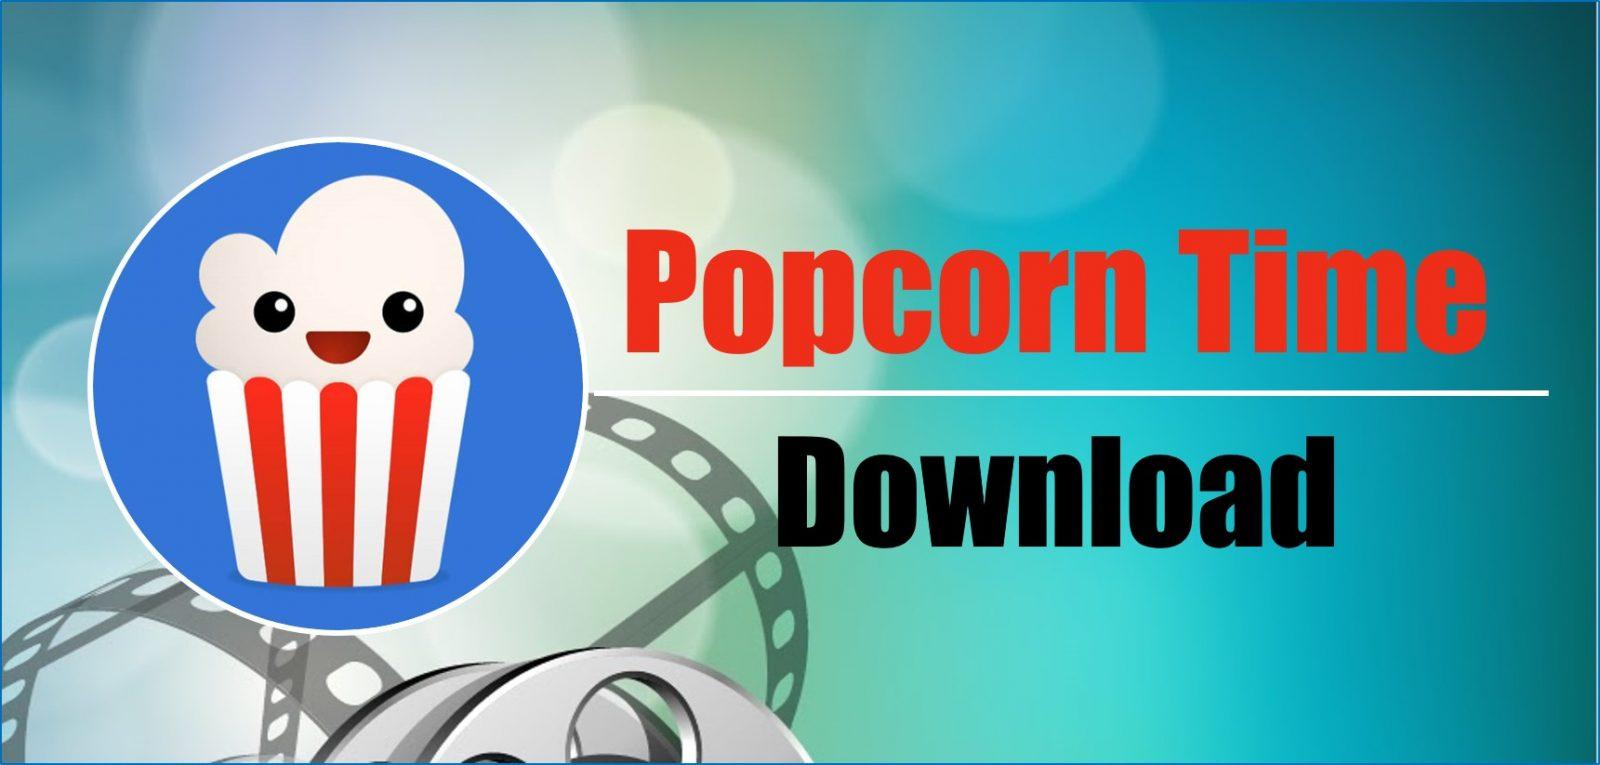 Popcorn Time Download